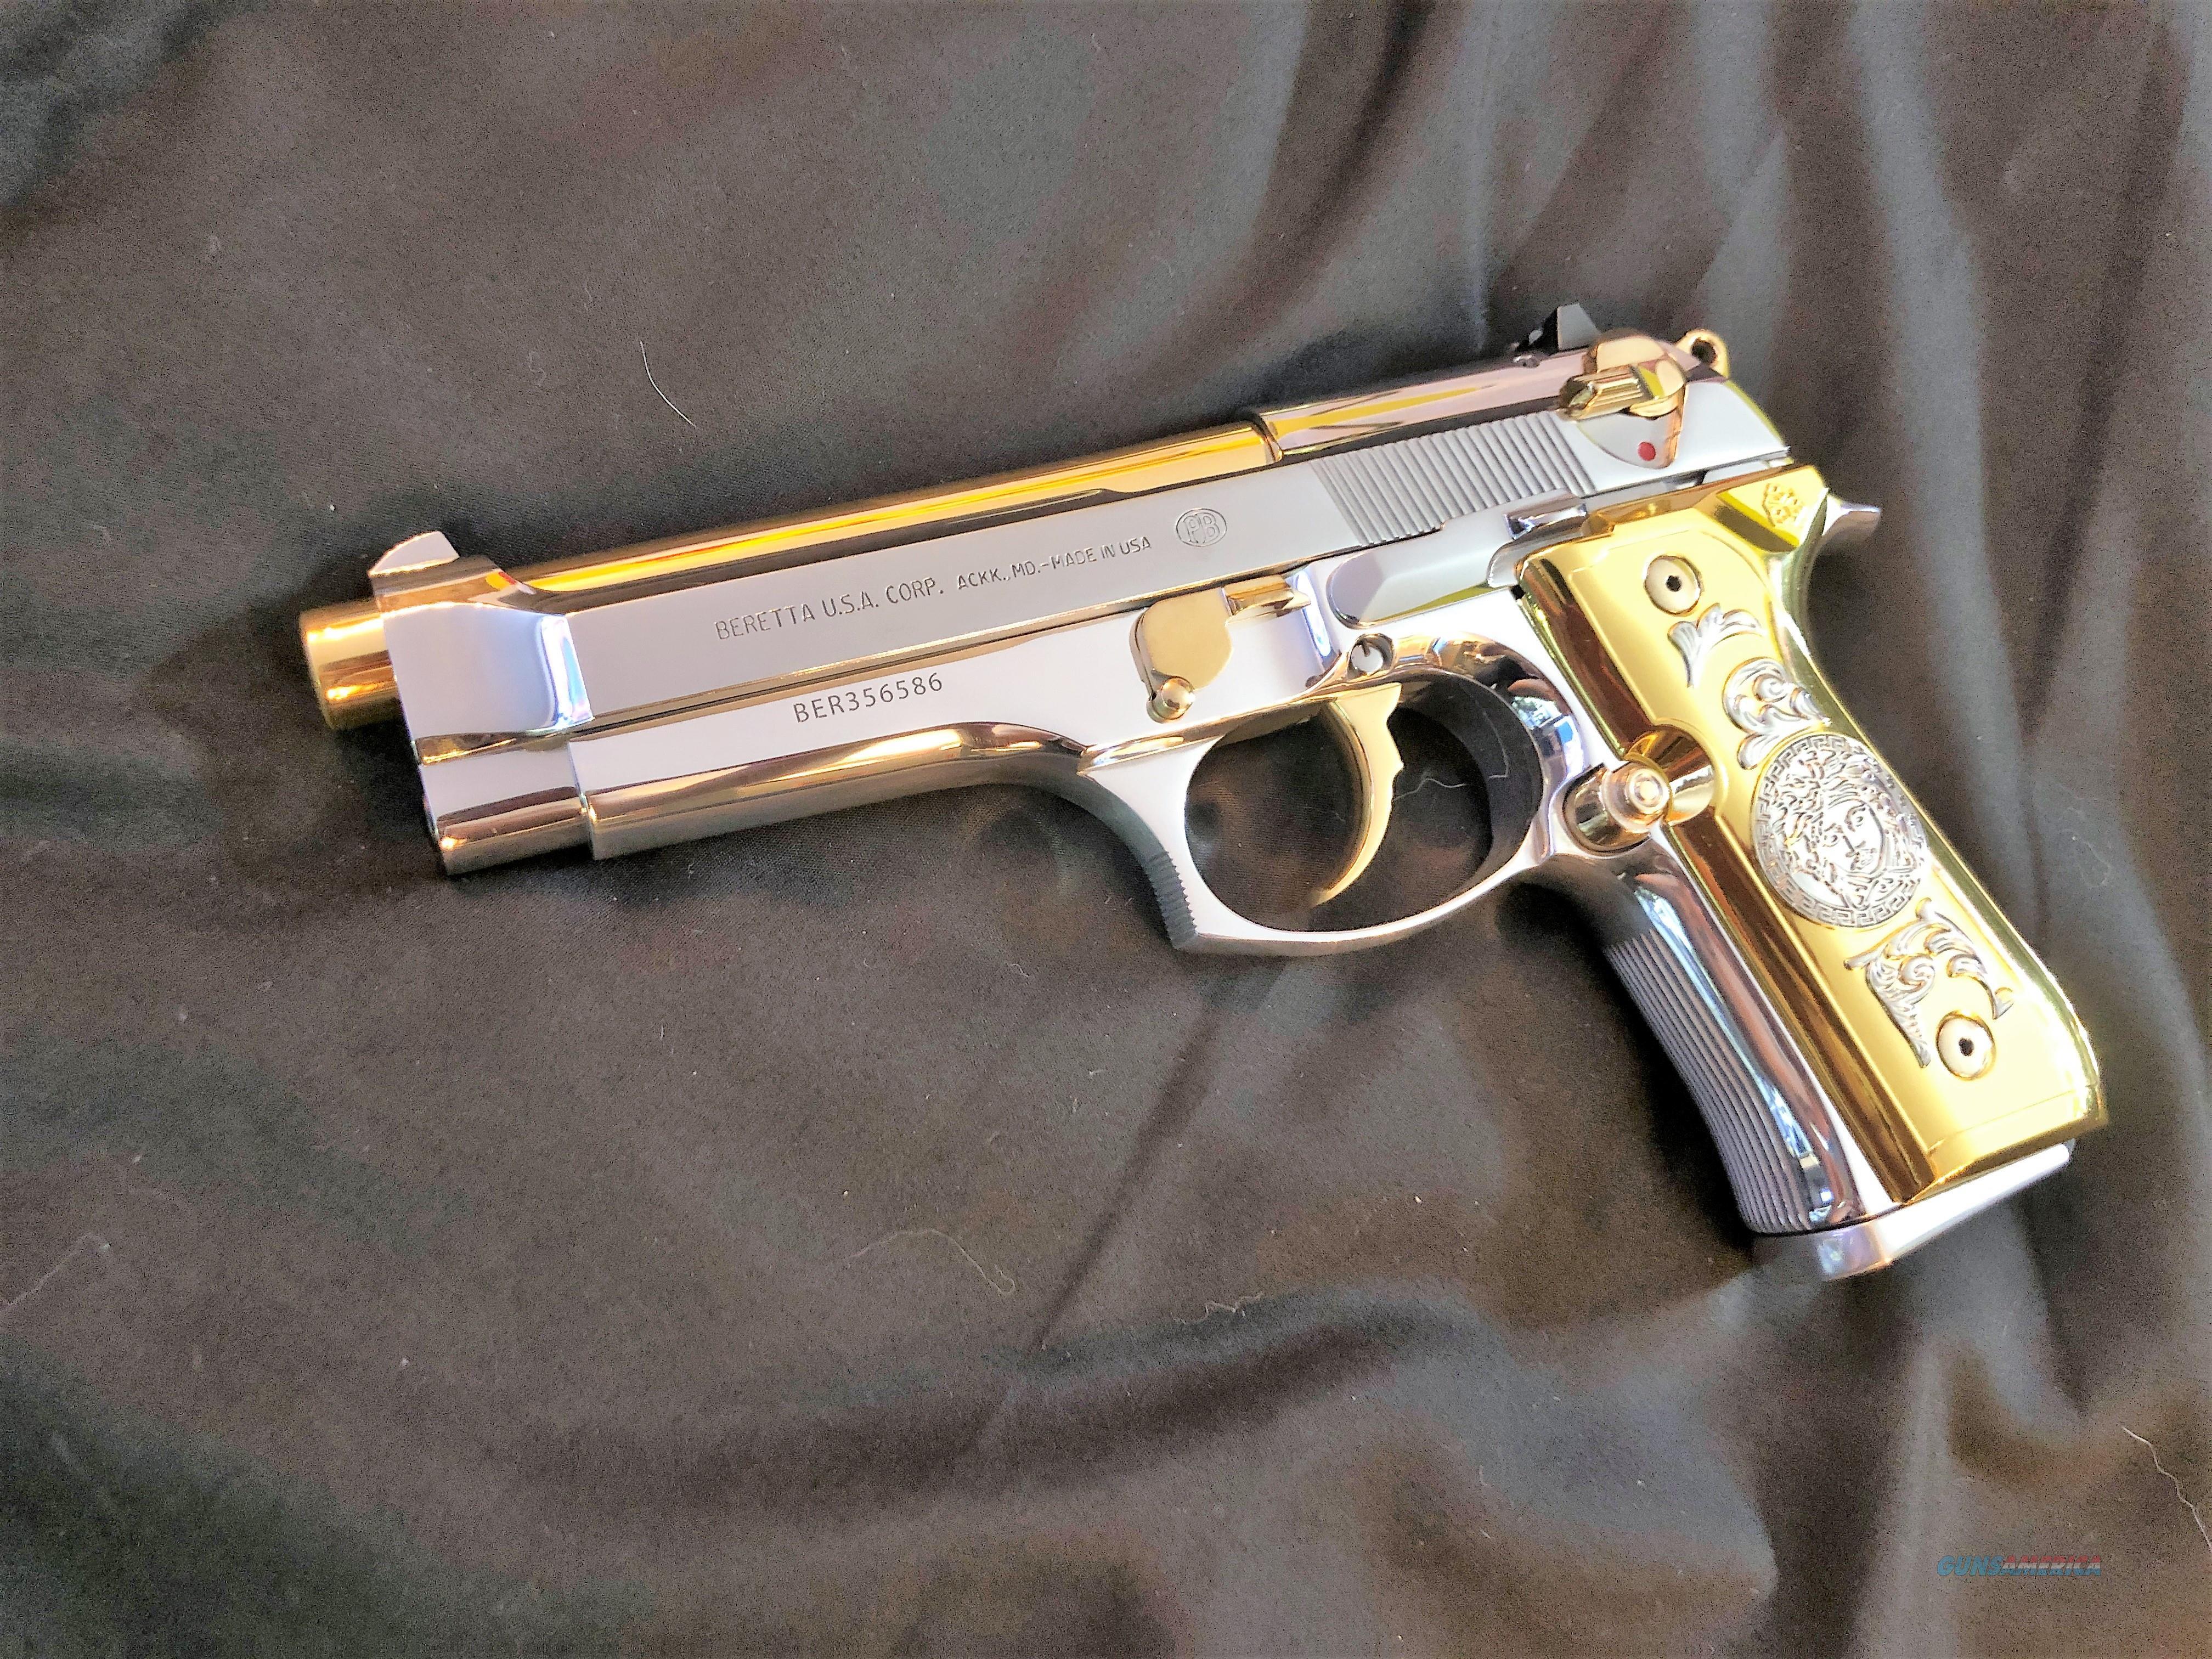 GORGEOUS Beretta 92 Custom 24k gold and bright stainless Versace grips  Guns > Pistols > Beretta Pistols > Model 92 Series